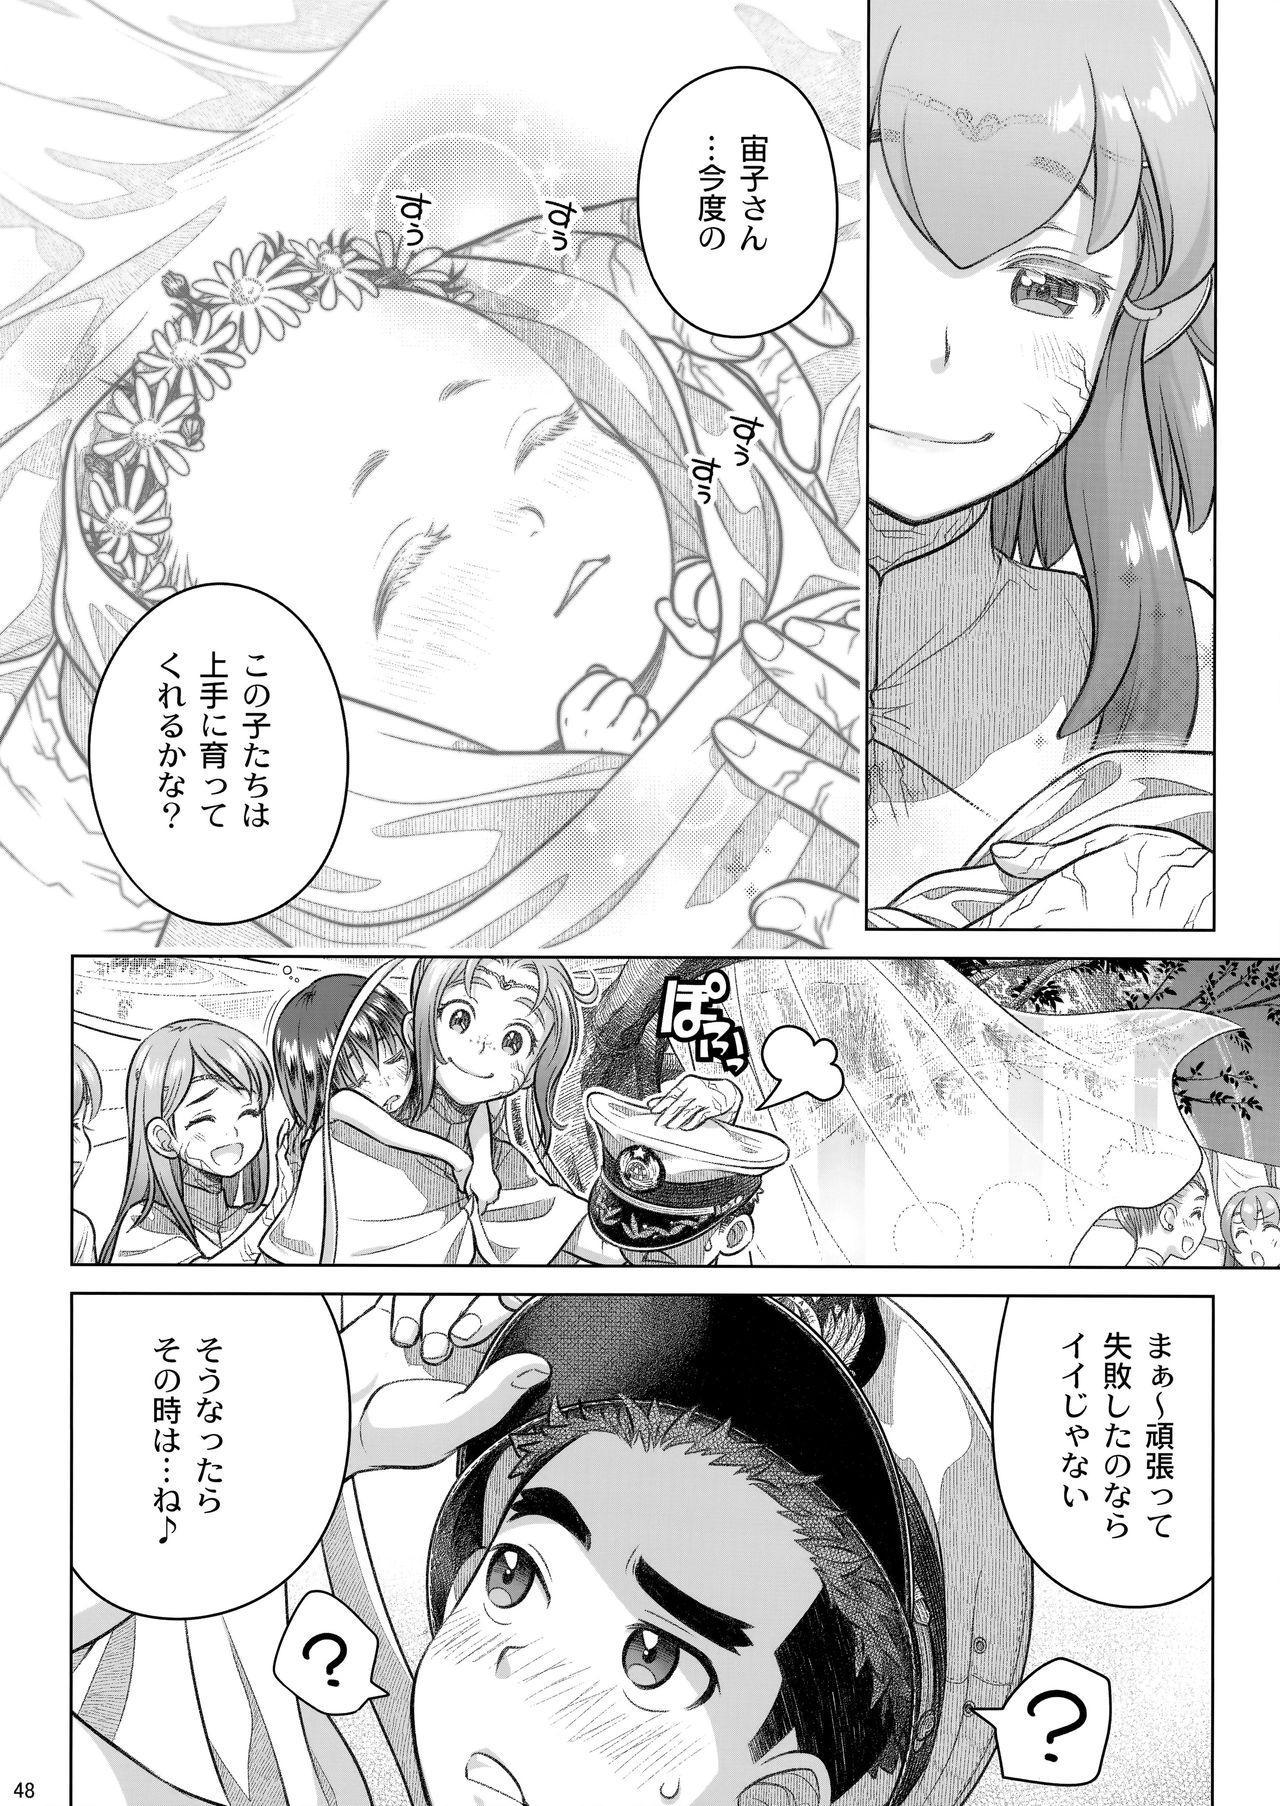 Sorako no Tabi 8 48